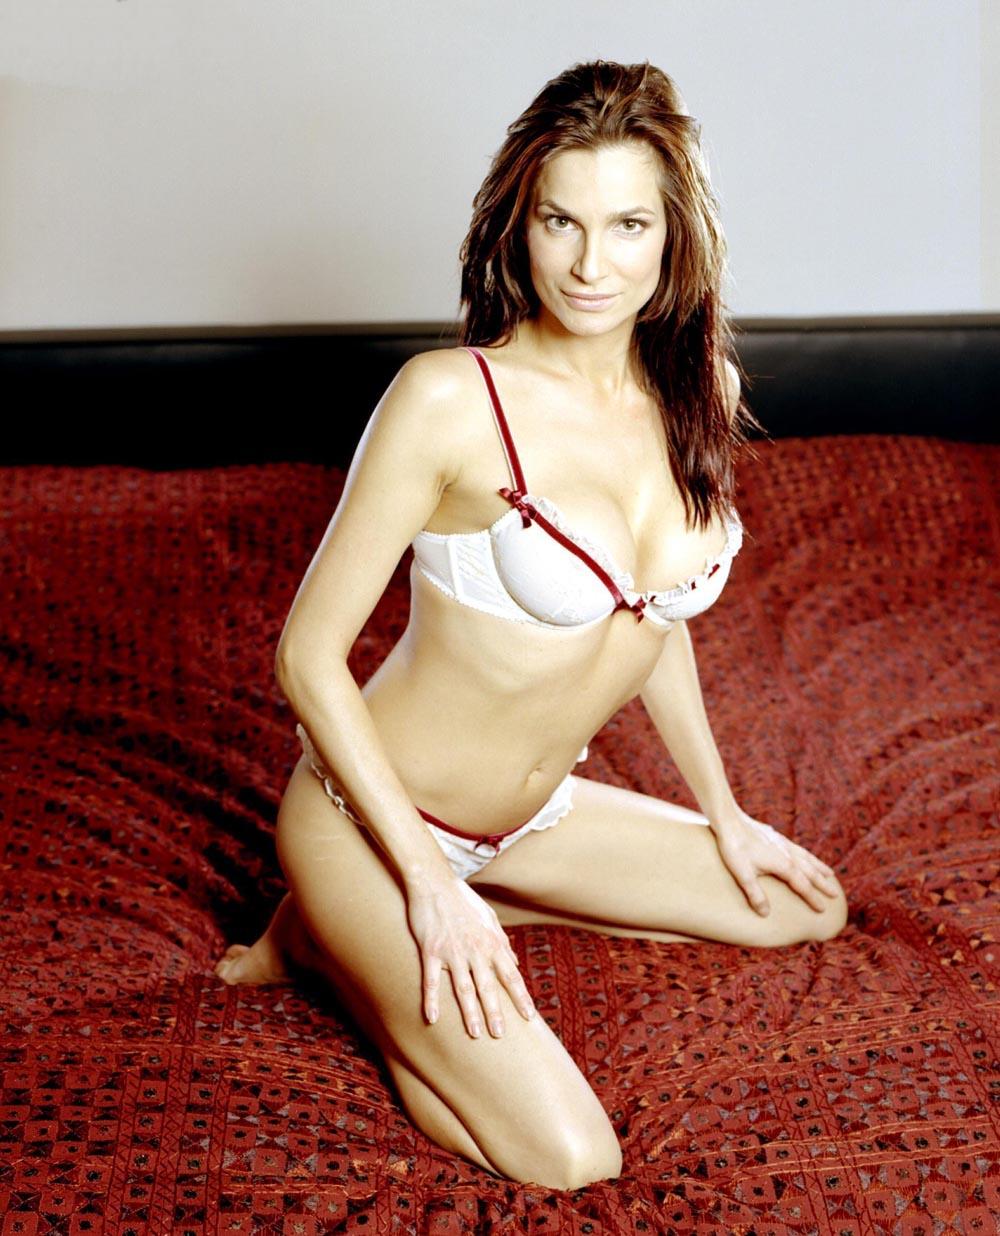 Александра Кэмп-Гроеневельд голая. Фото - 28